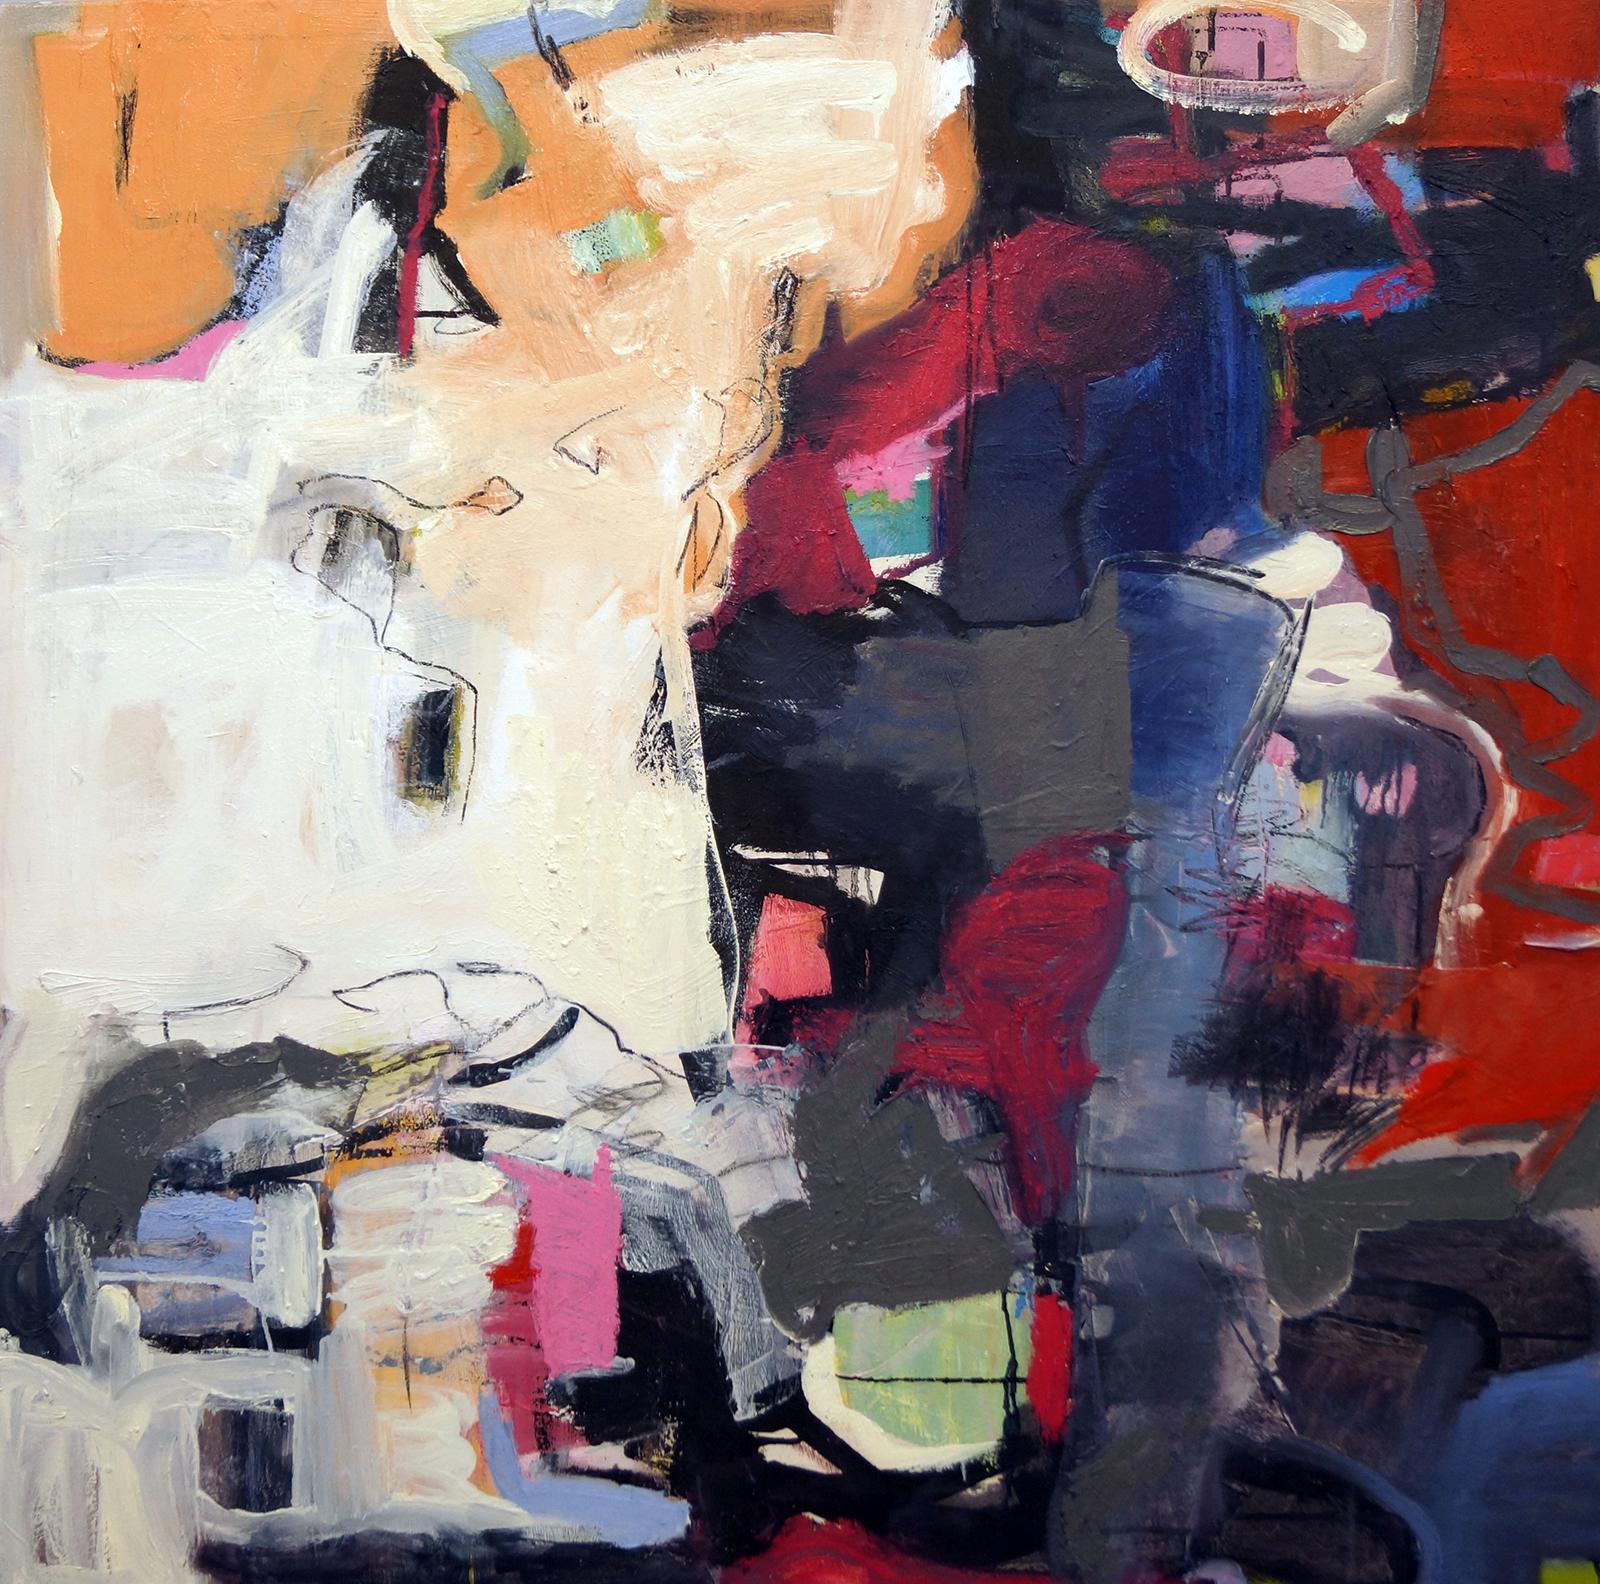 Rhythm in Blue by Cheri Vilona | ArtworkNetwork.com